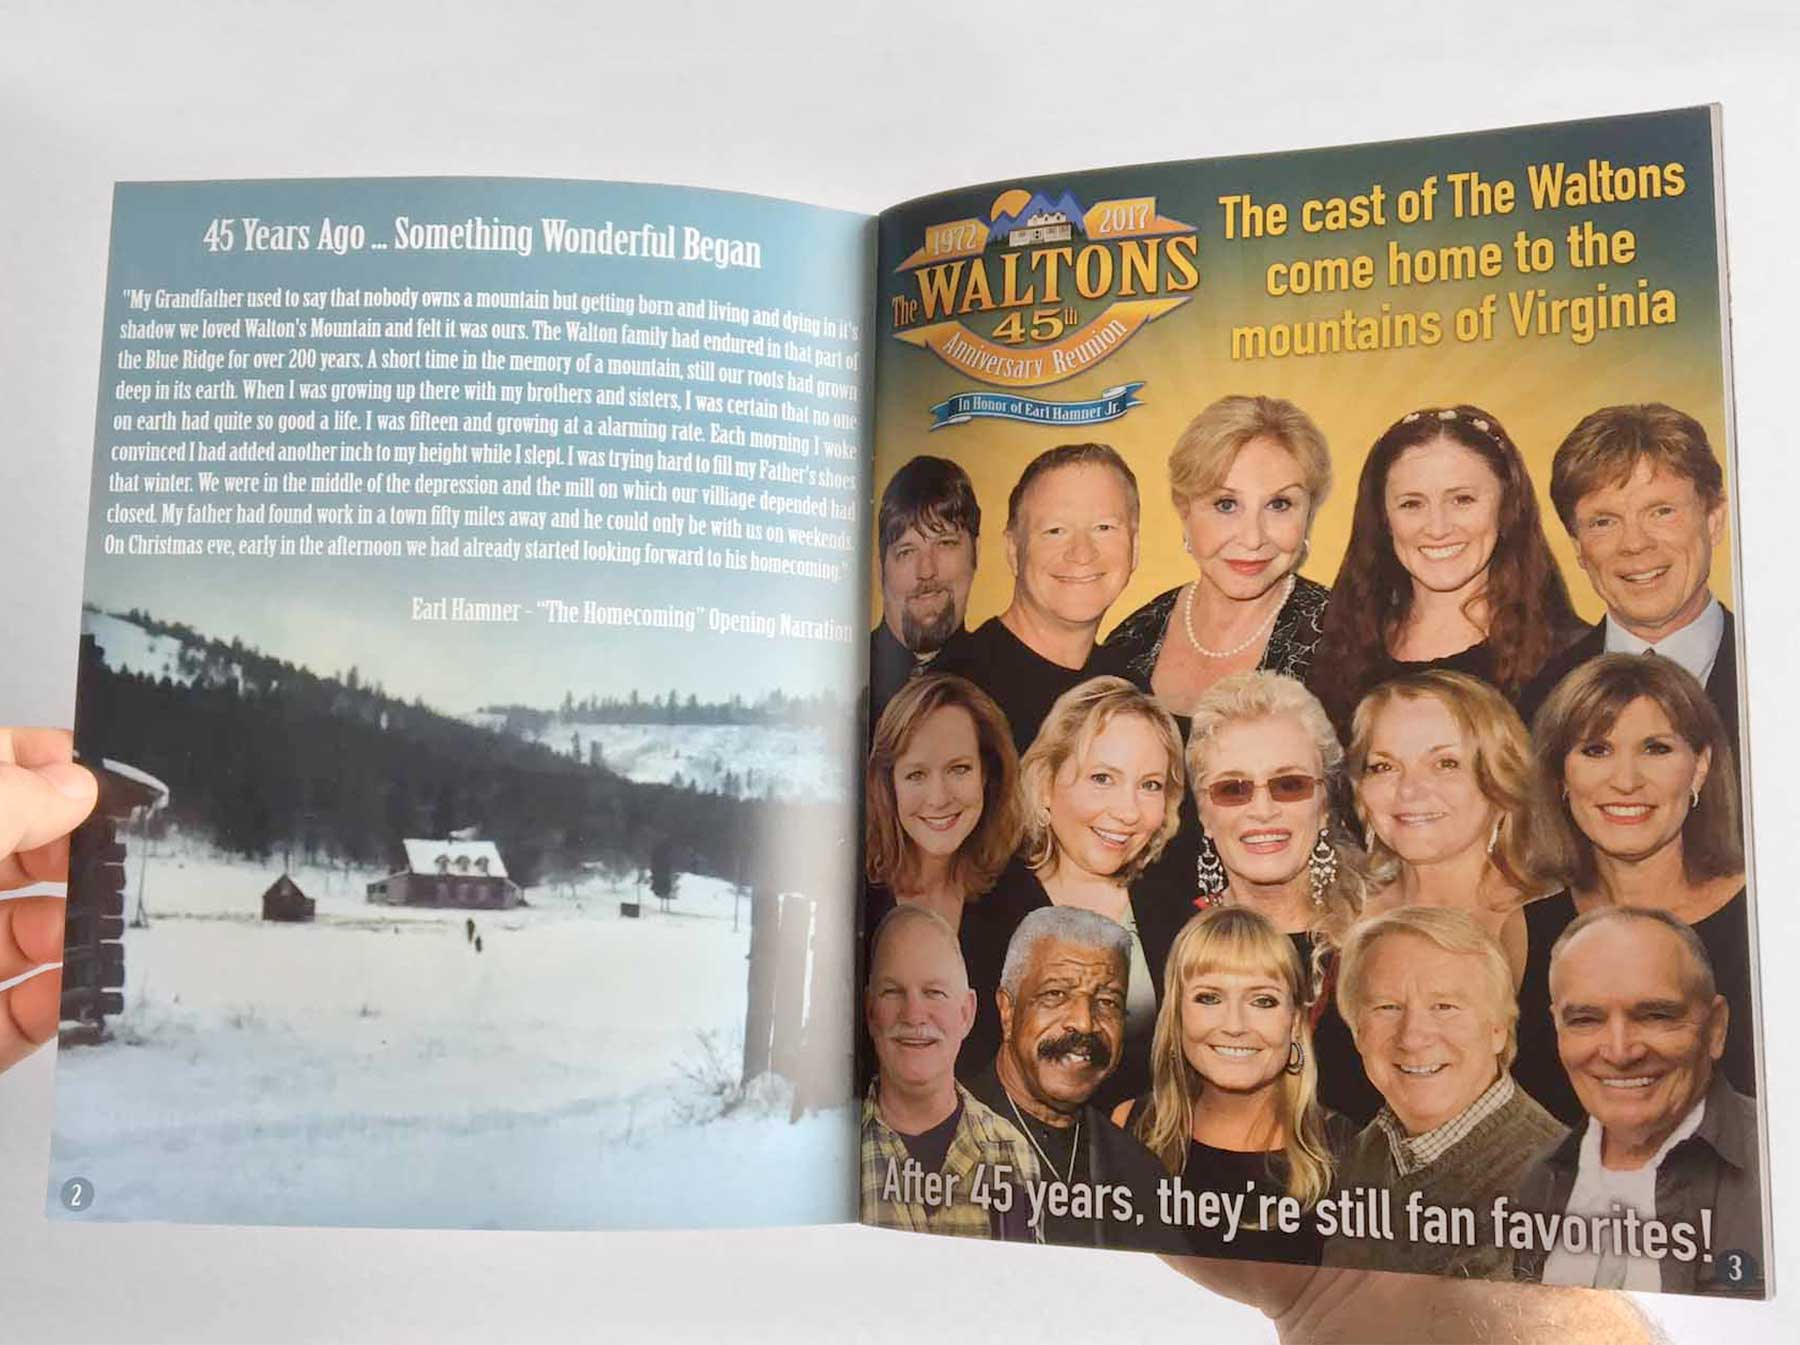 A souvenir program for The Waltons 45th Anniversary Reunion